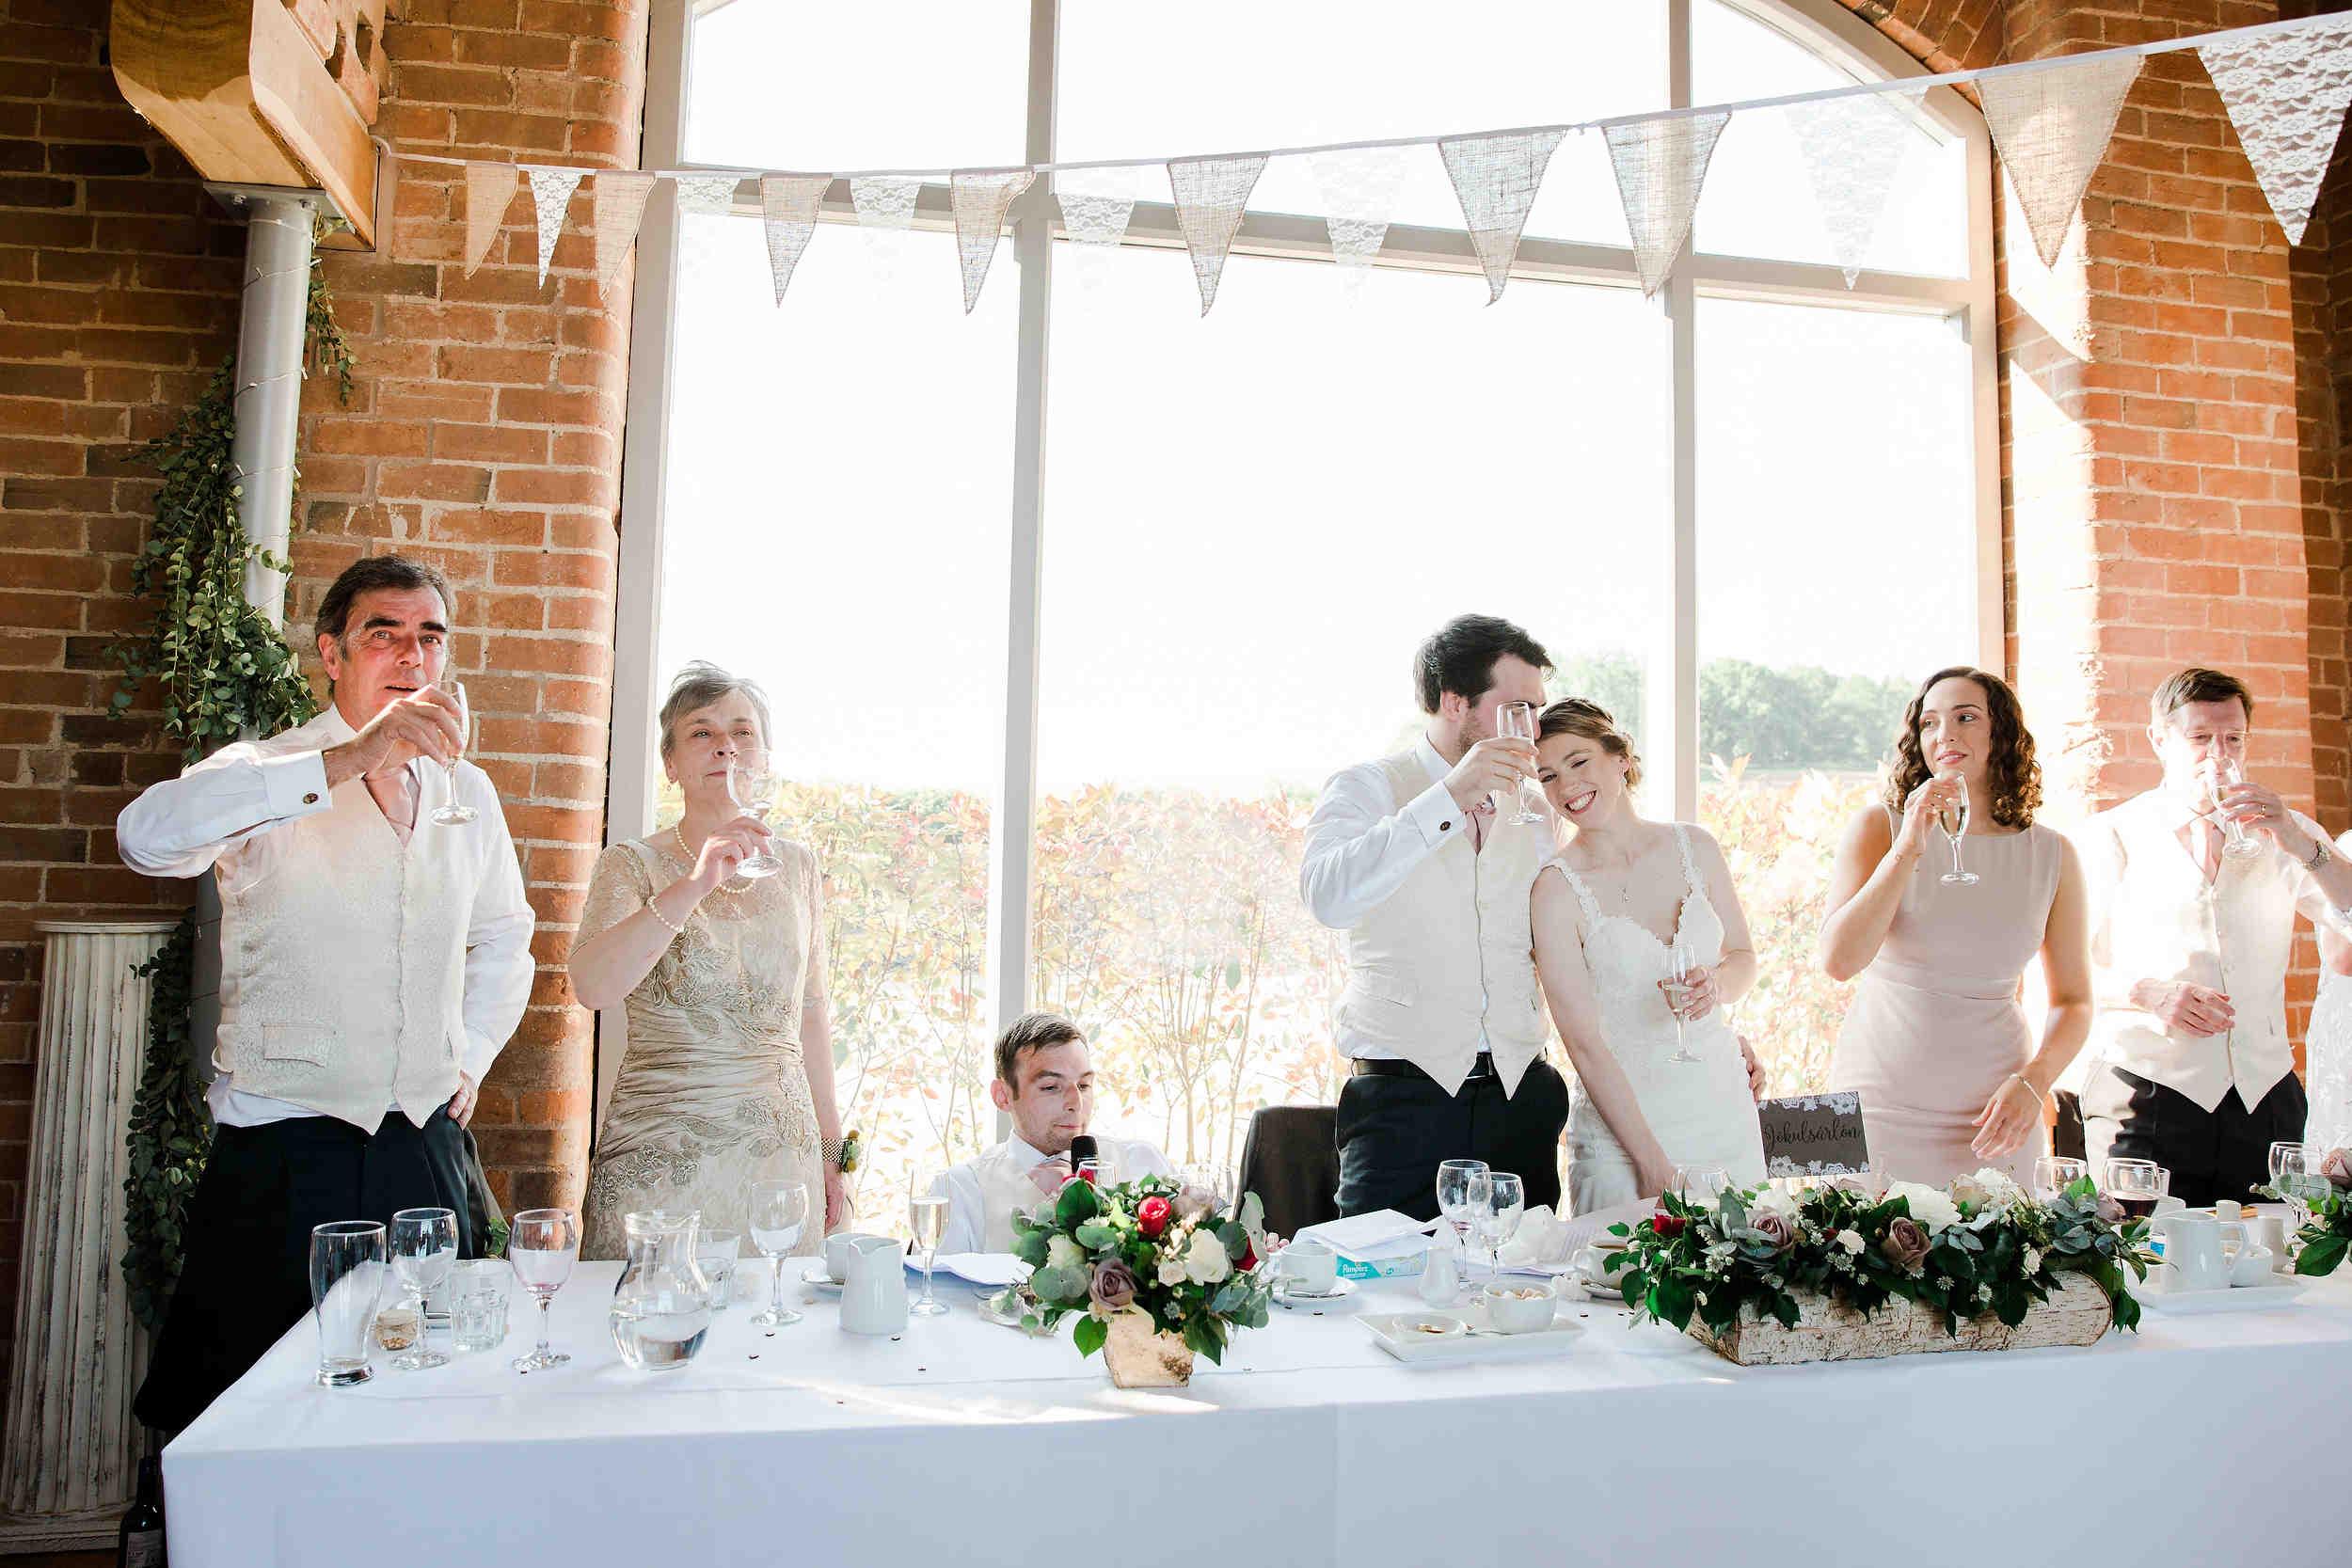 Modern_Stylish_Wedding_at_Swallows_Nest_Barn1261